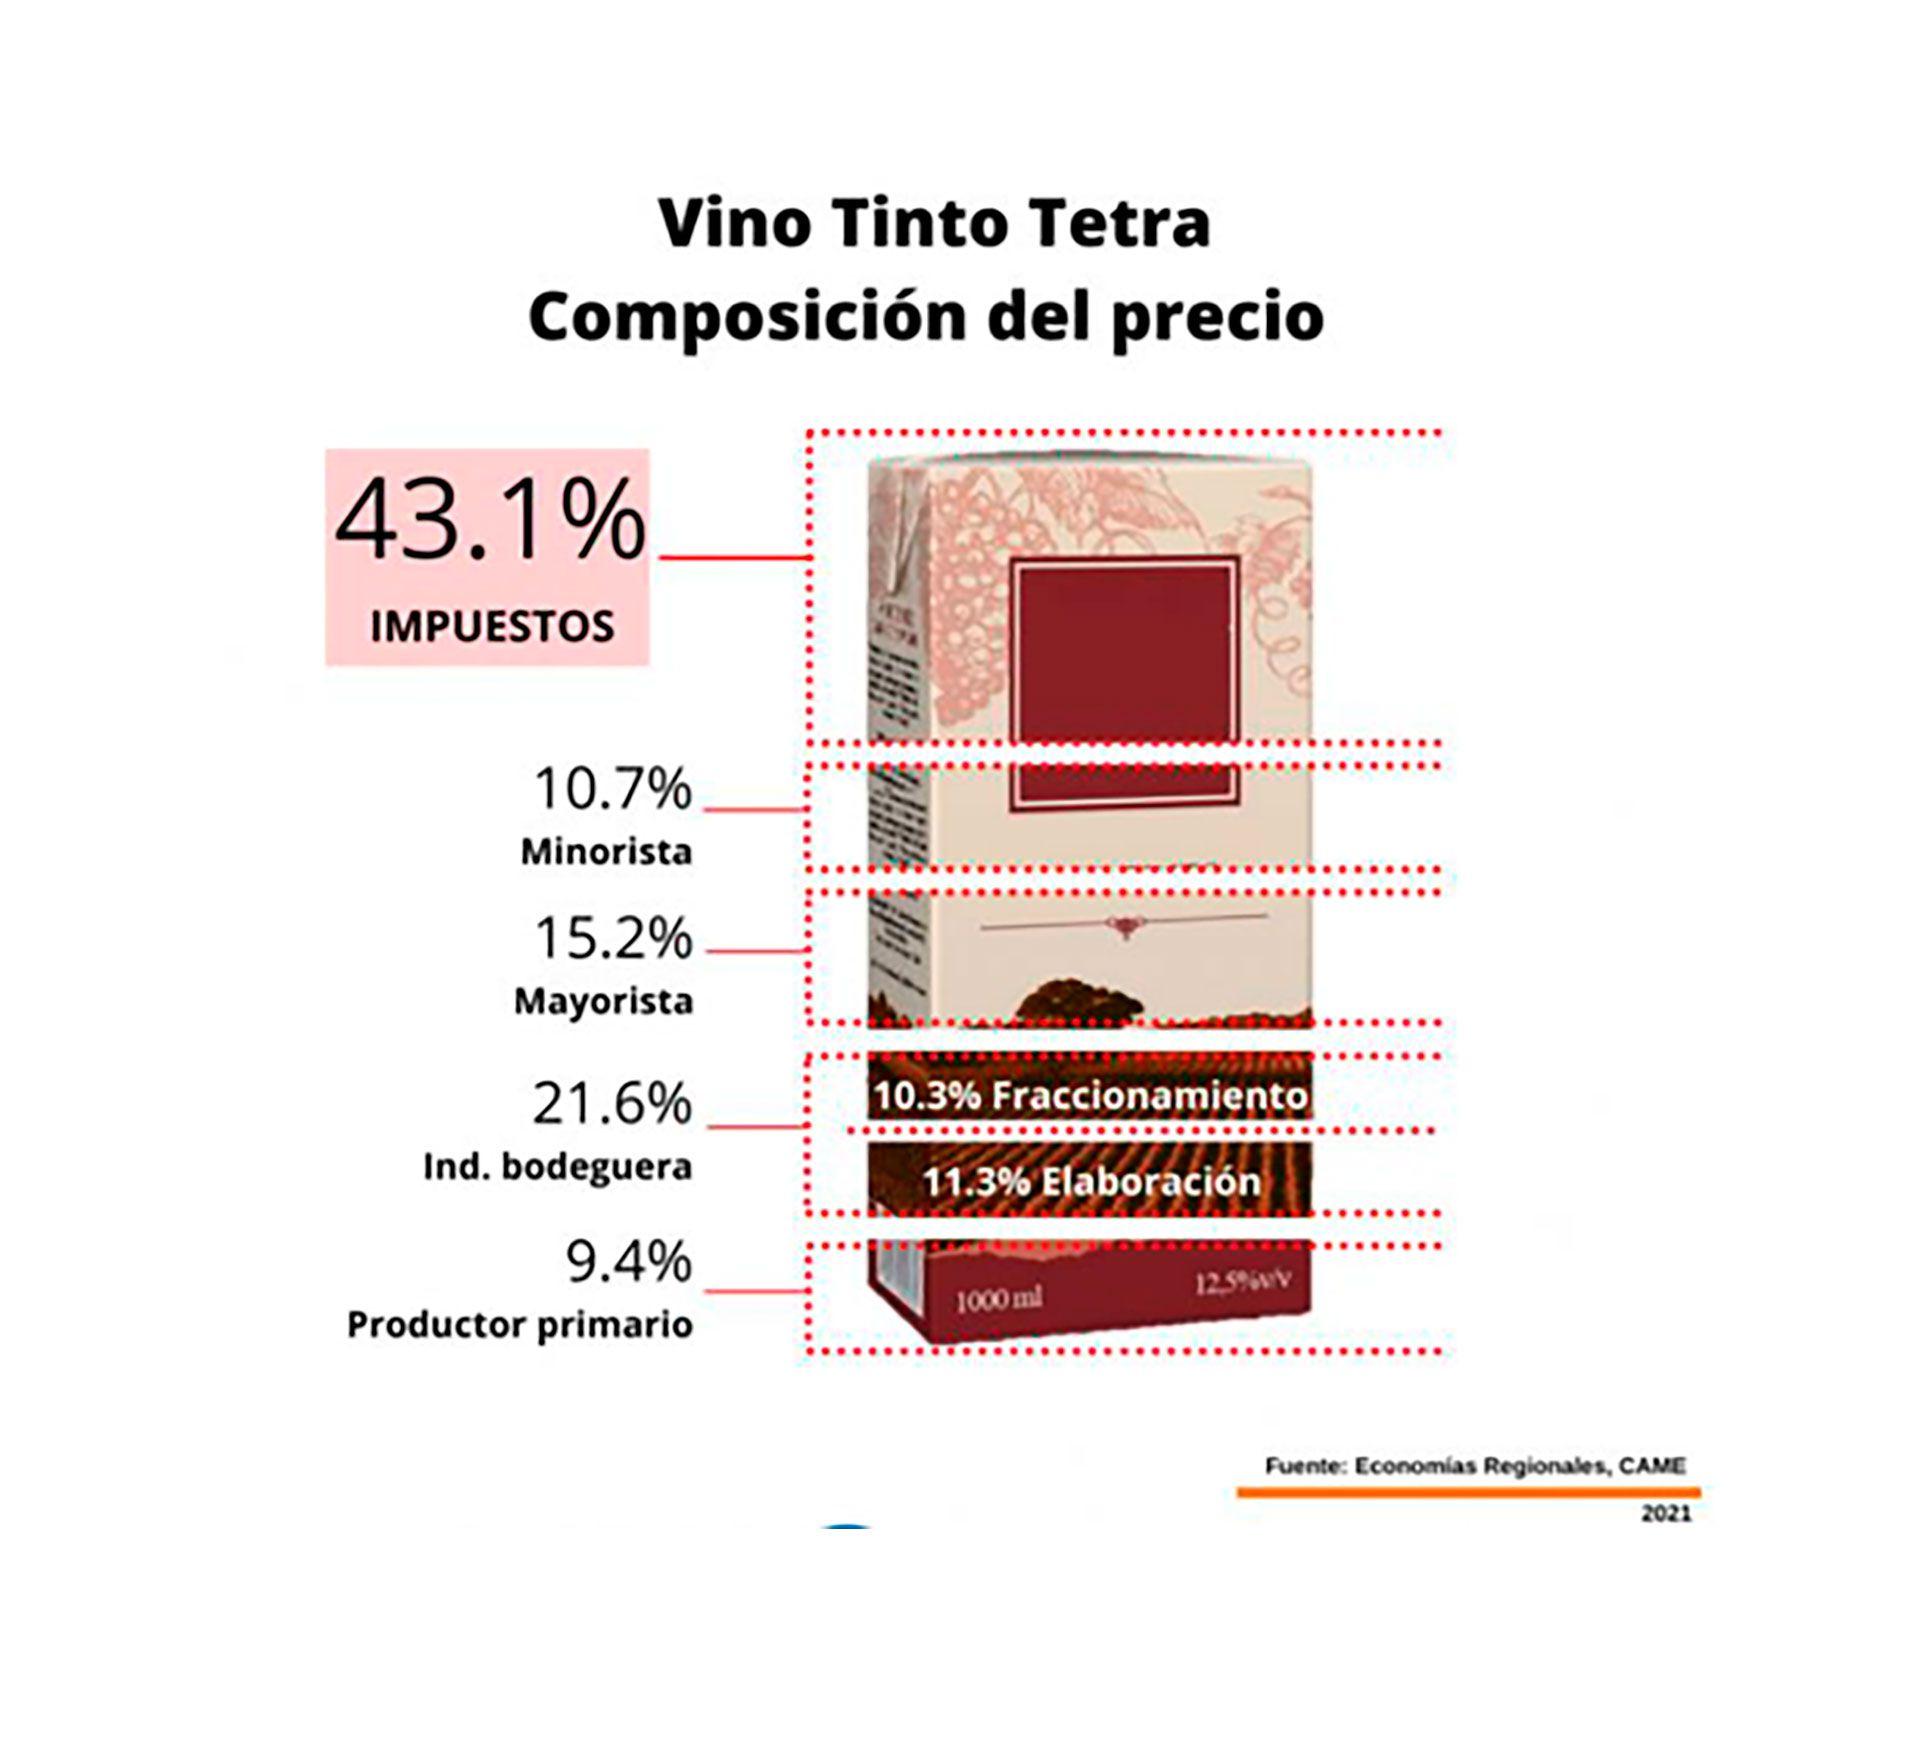 Vino-Precio-Tetra-Botella-CAME